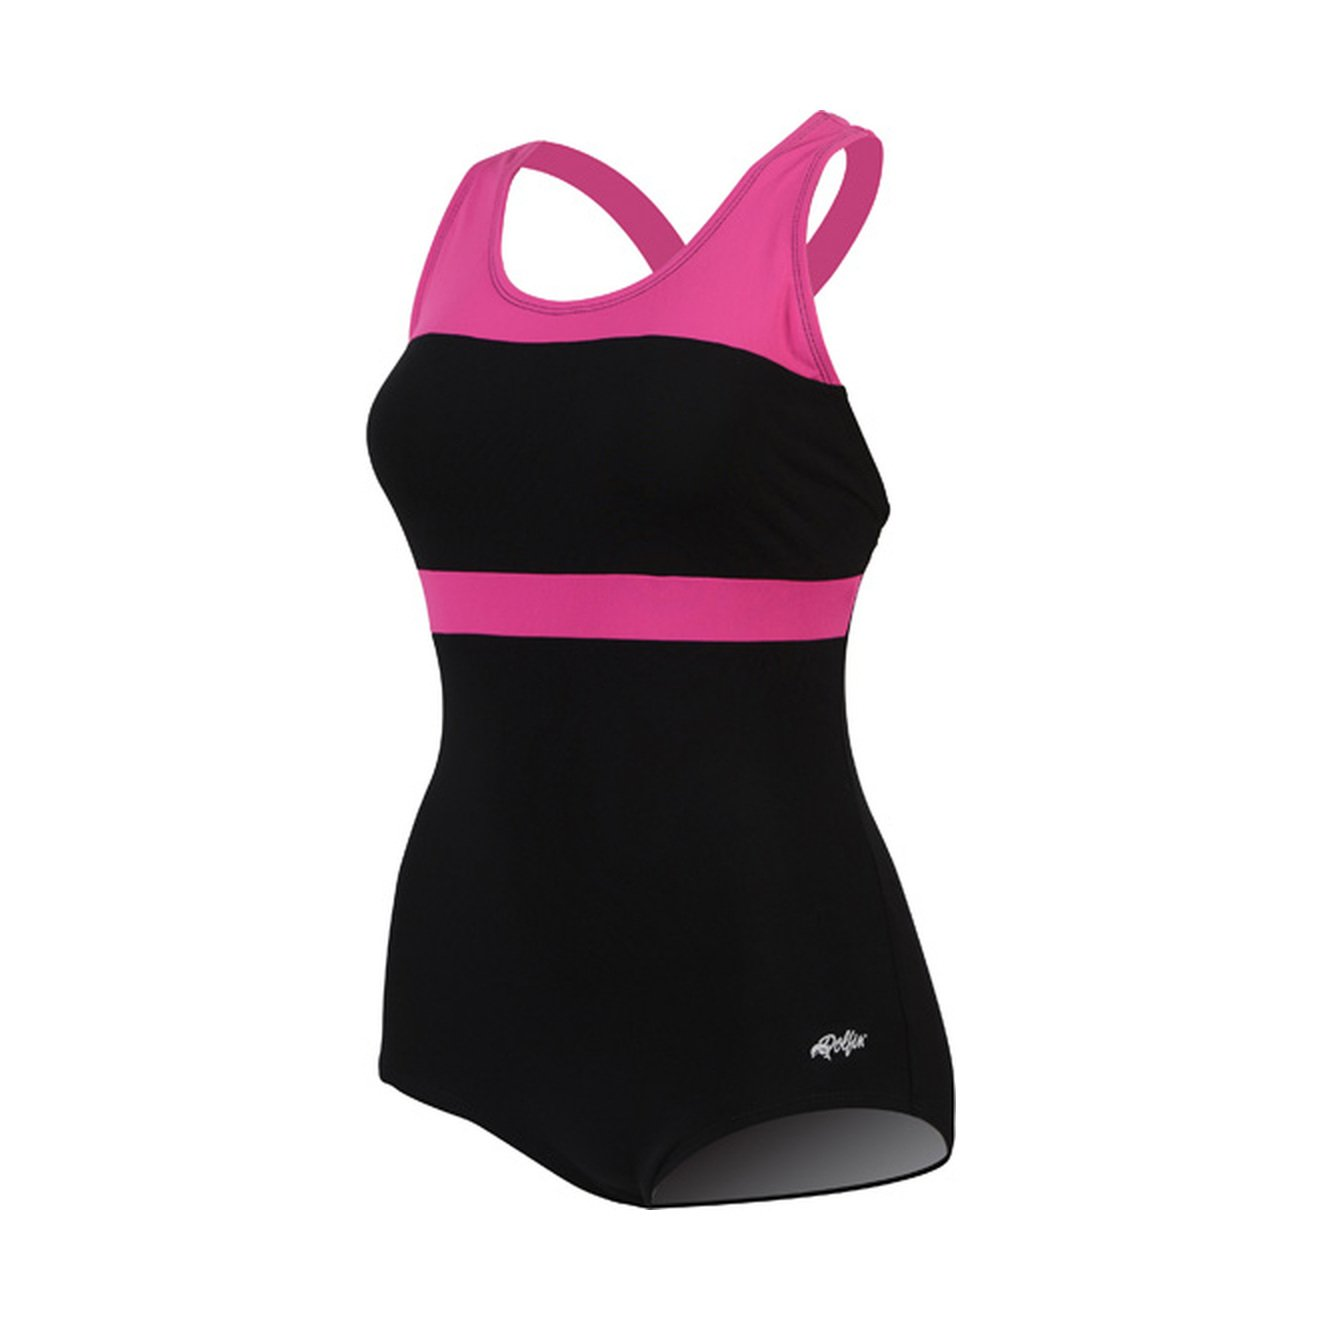 DolfinスプラッシュConservative Lap Suit Womens B00UB2ABEC 16|ブラック/ピンク